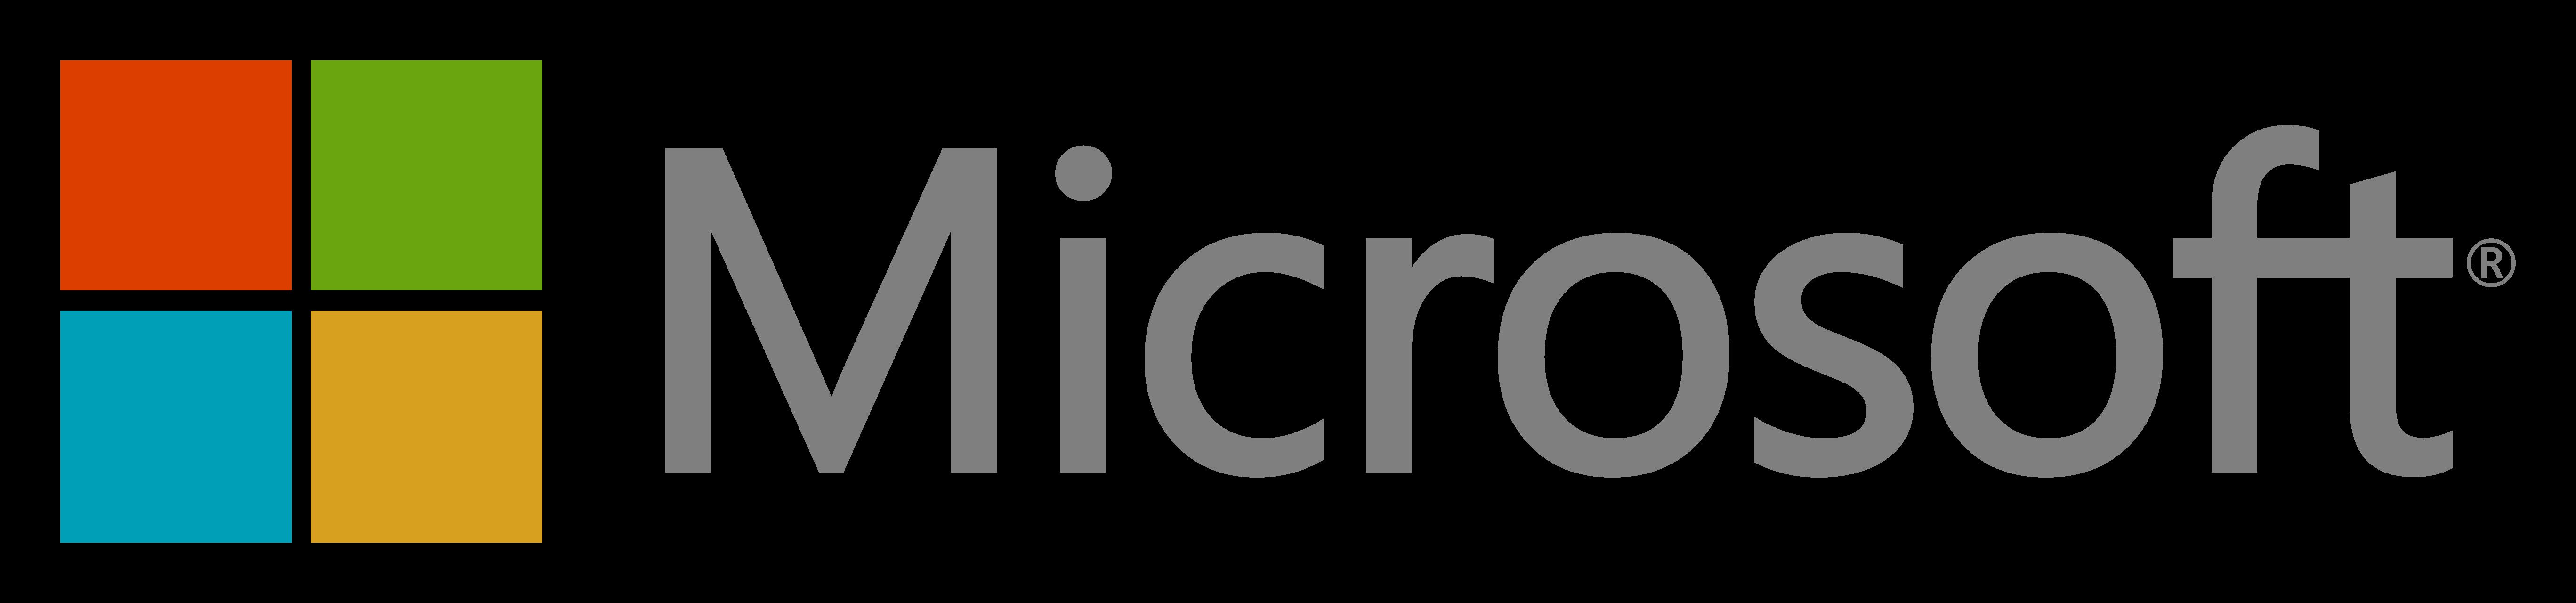 Microsoft Corporation's logo